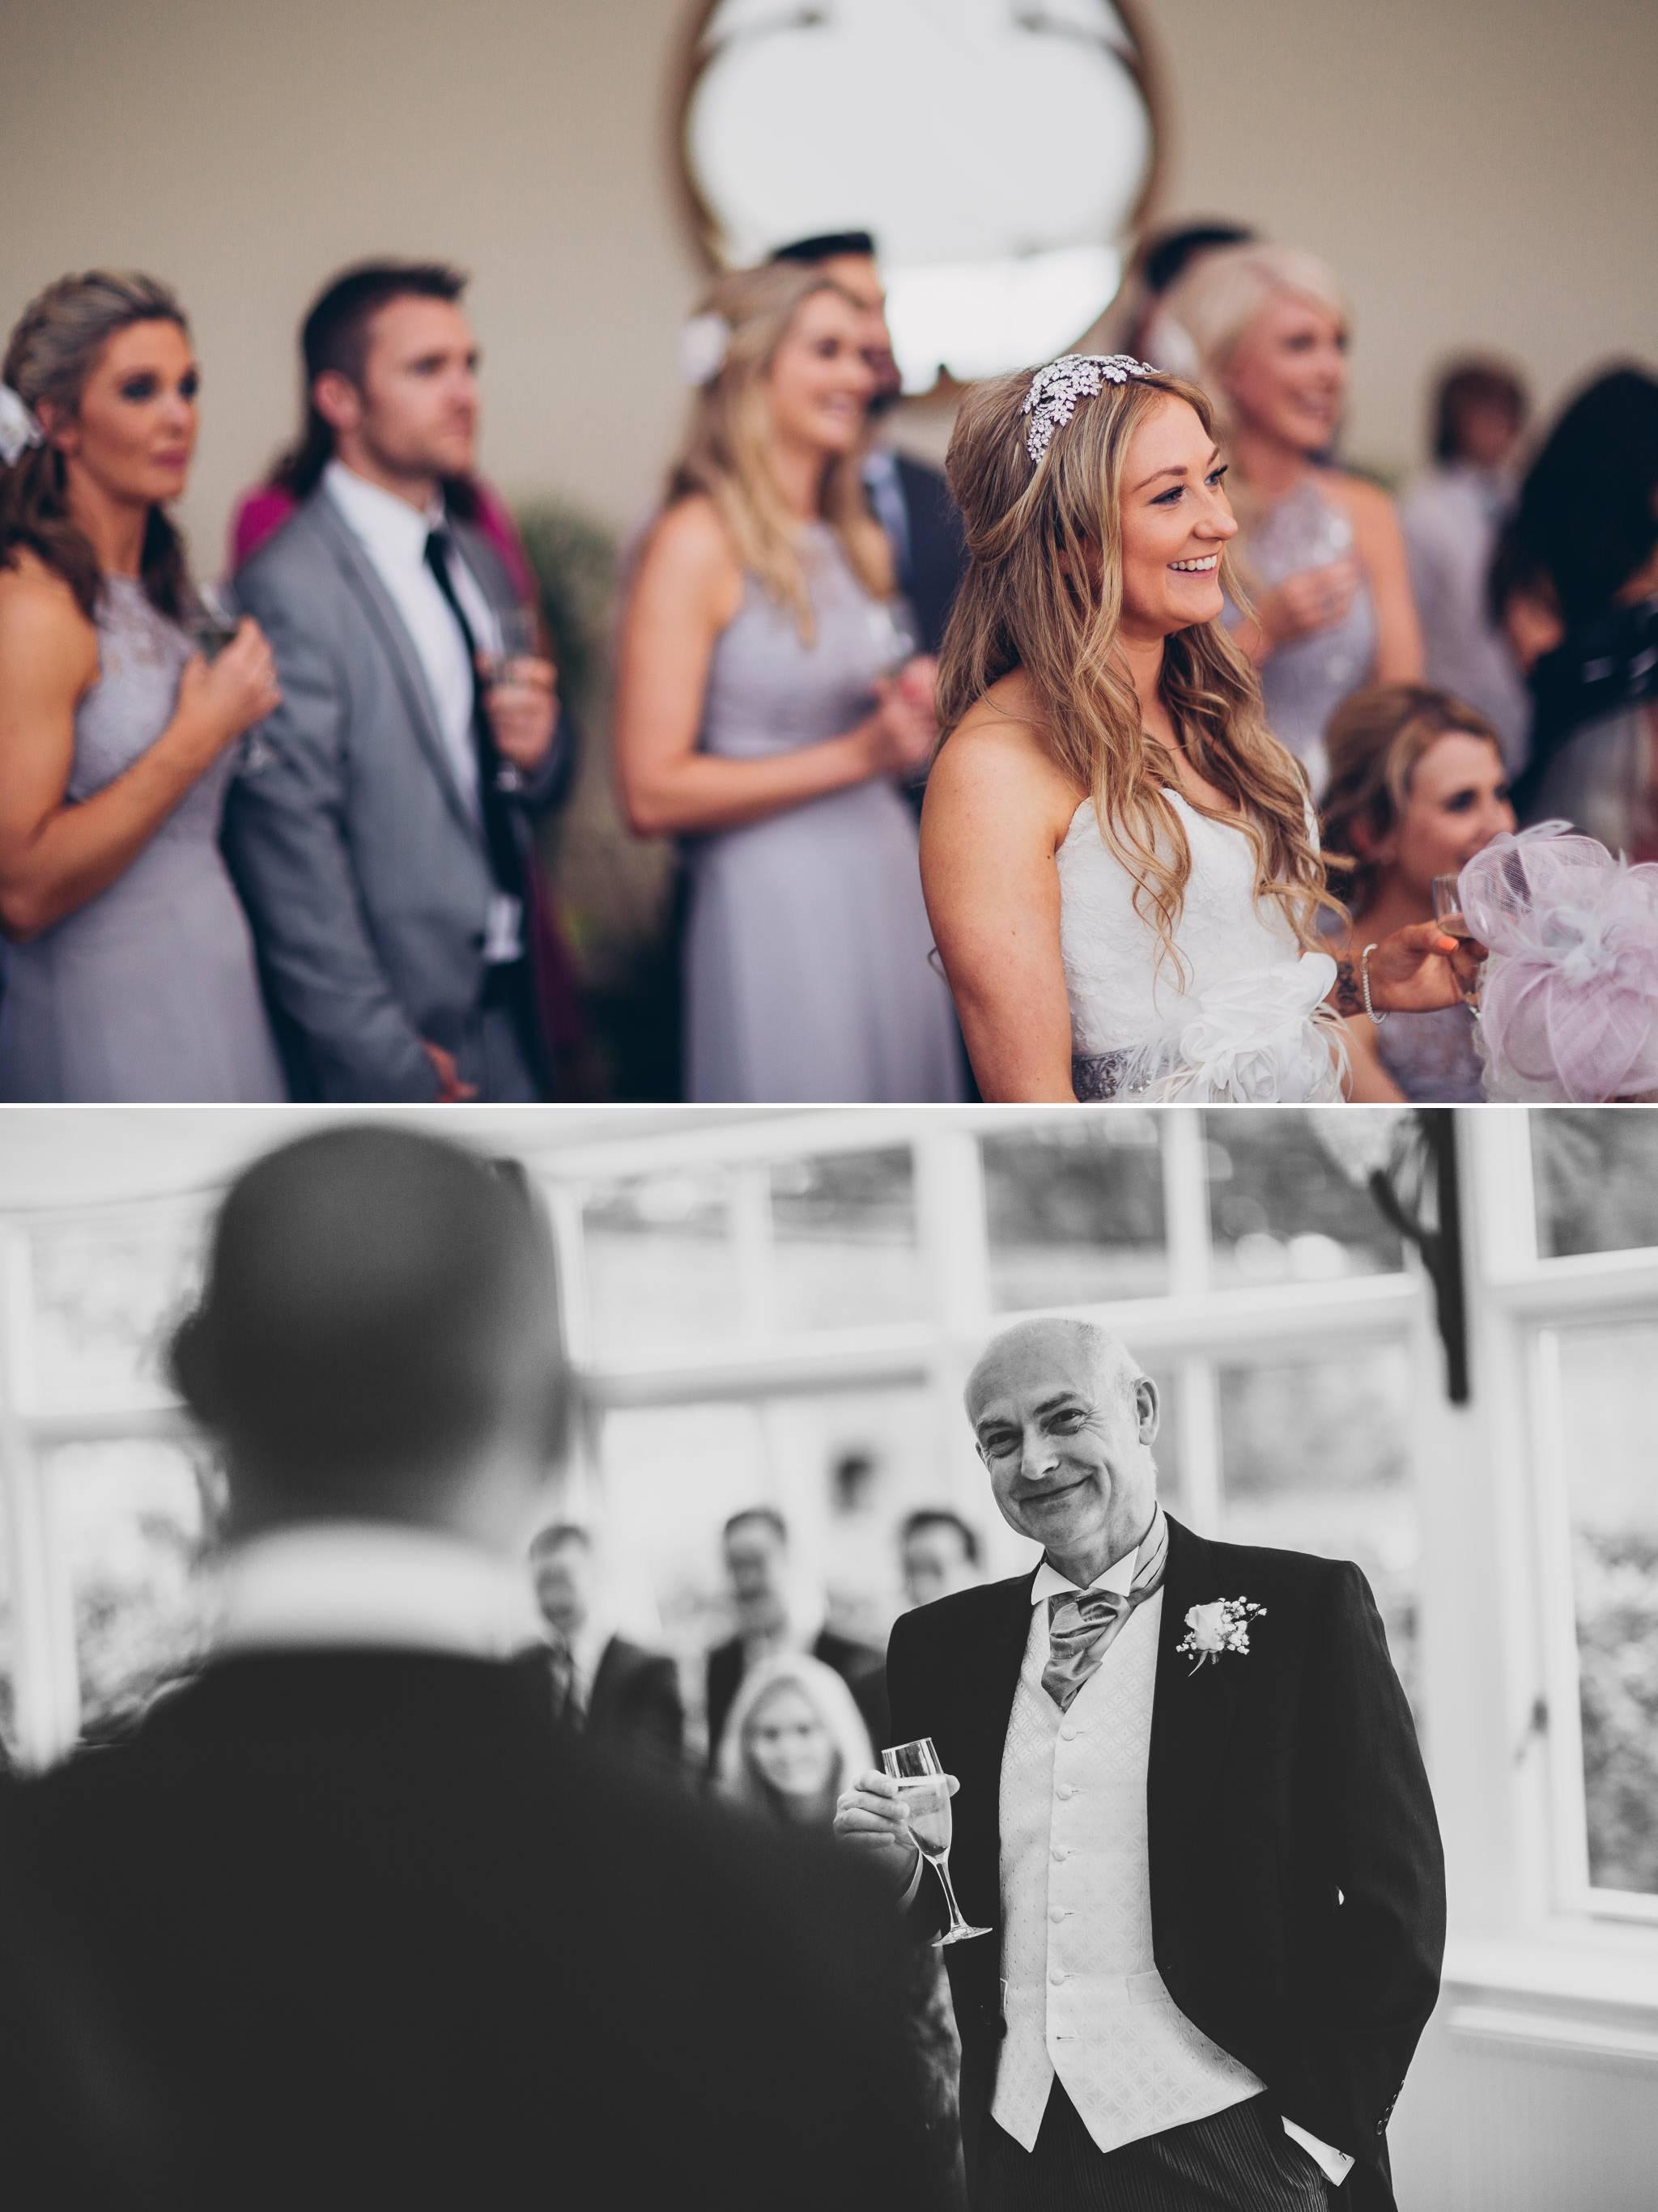 shropshire-wedding-photography 23.jpg